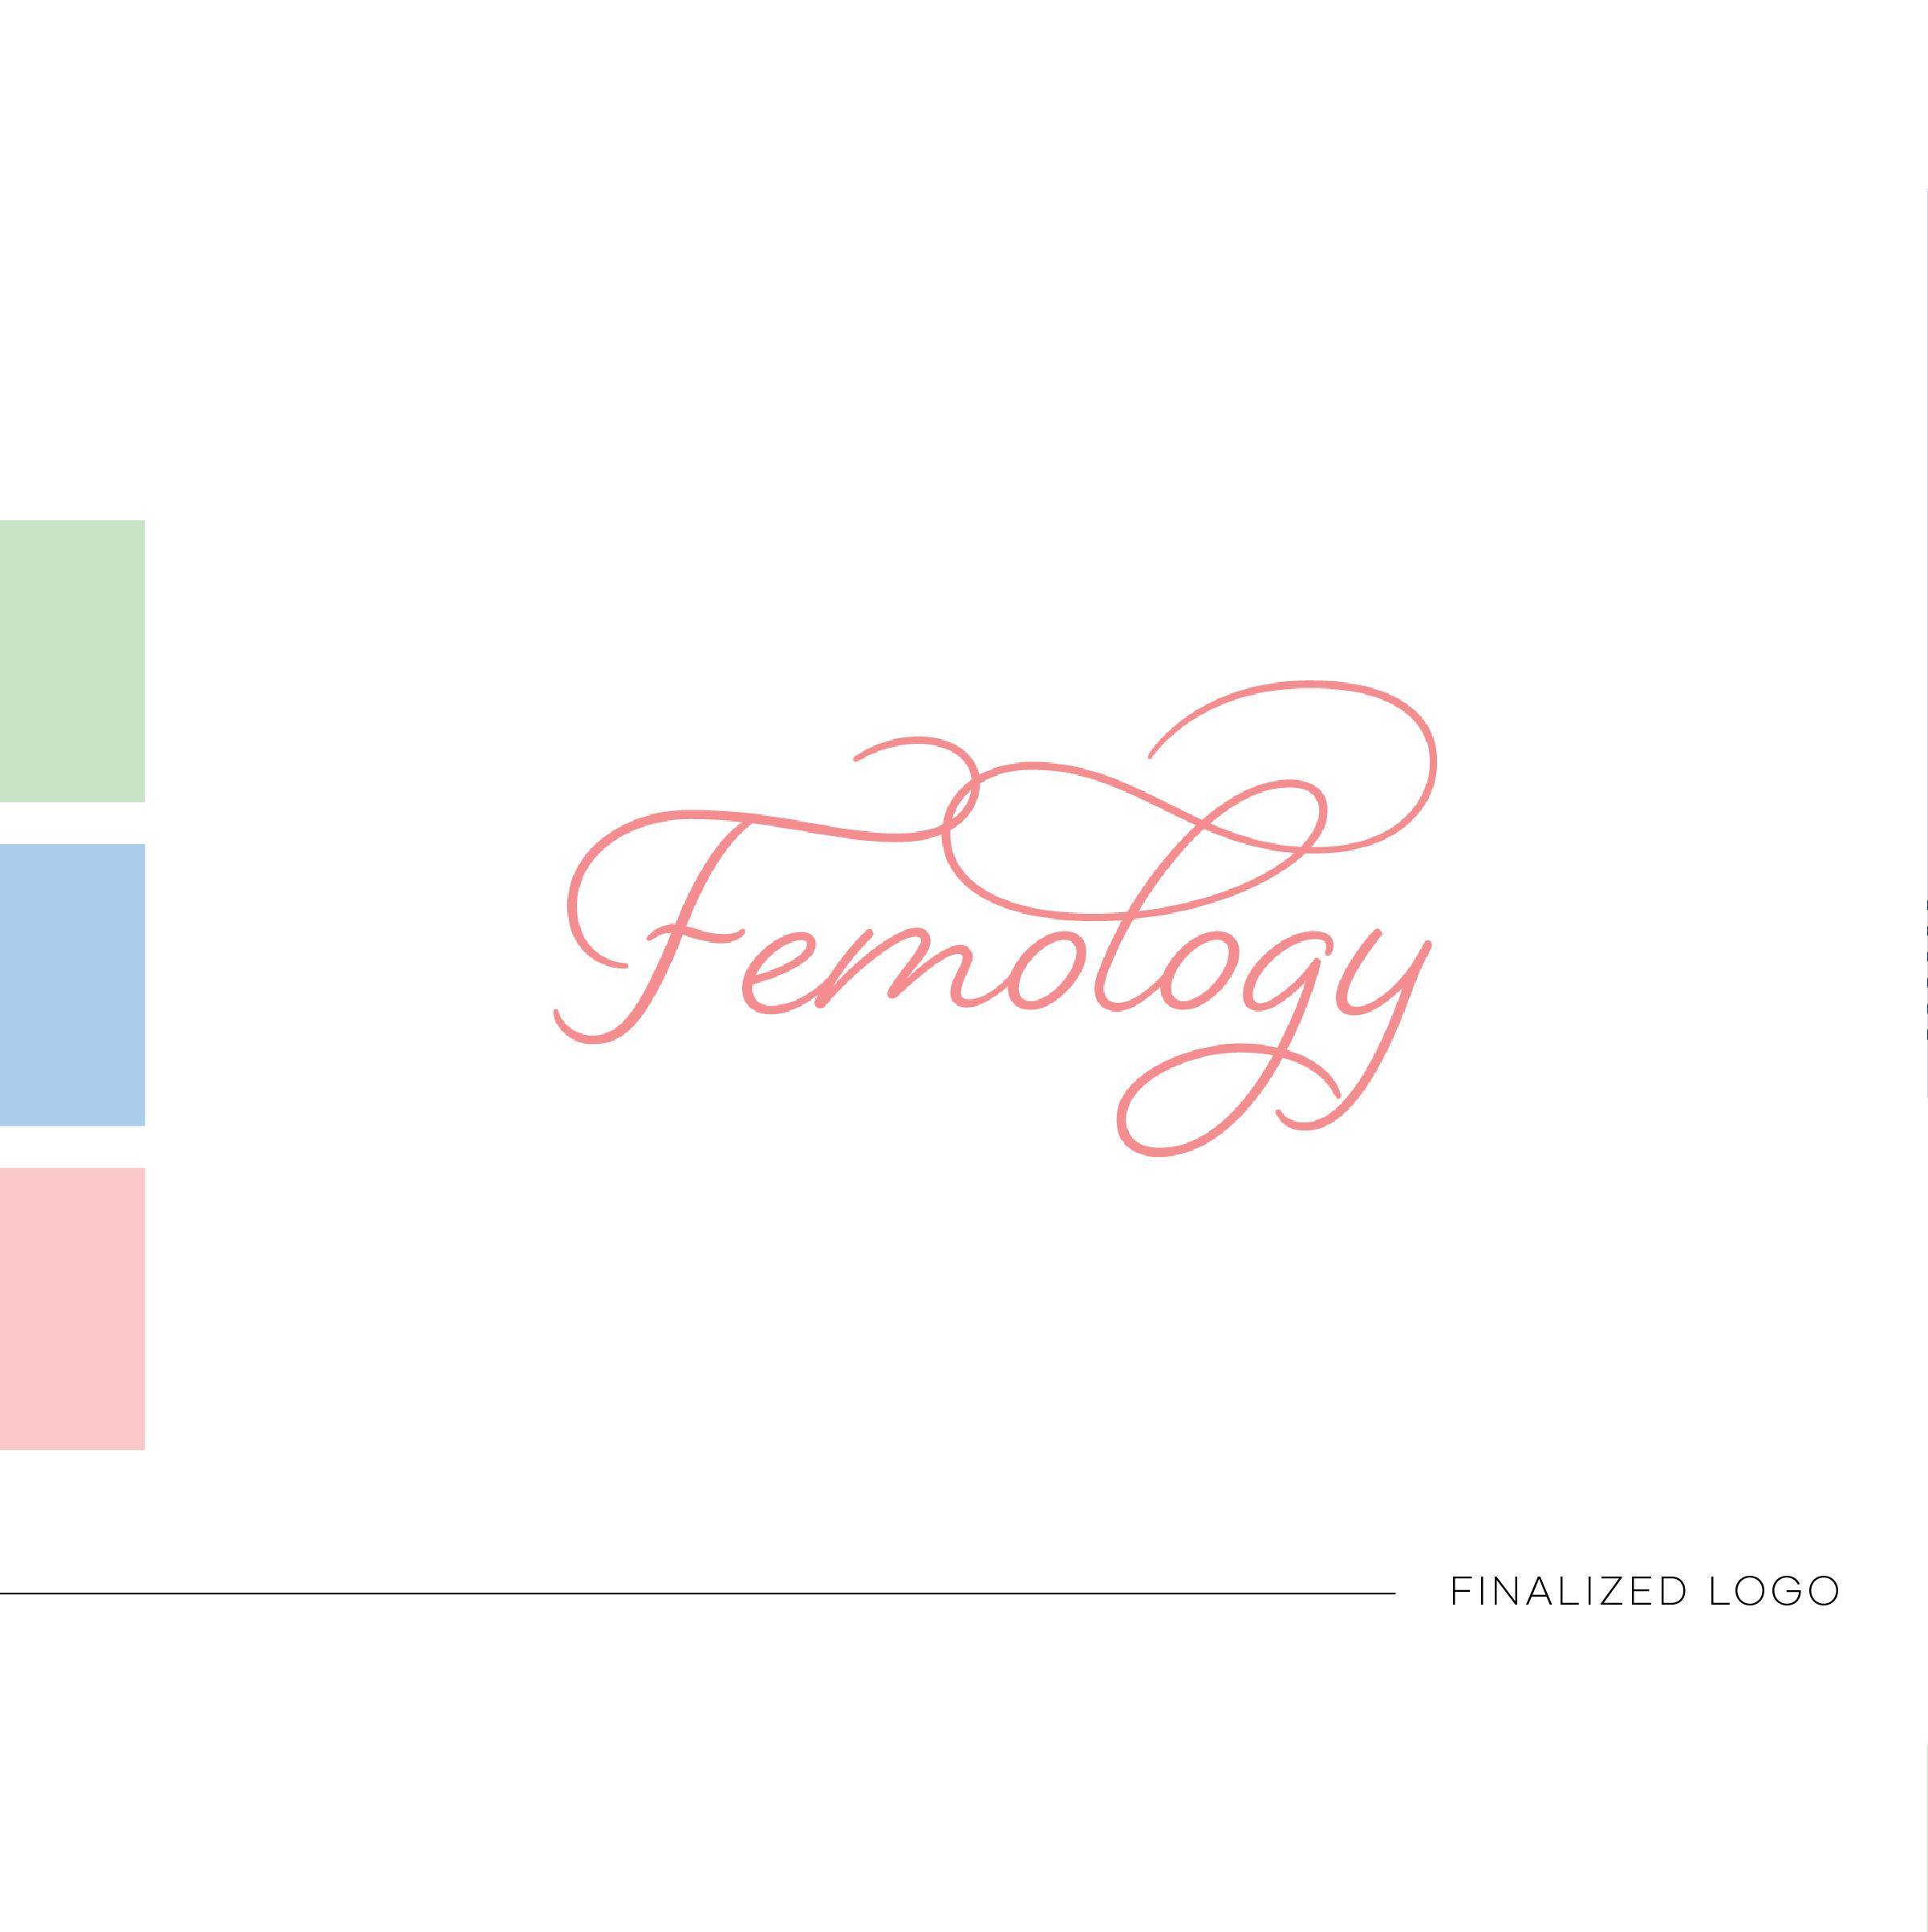 Femology_Swipes_3C.jpg